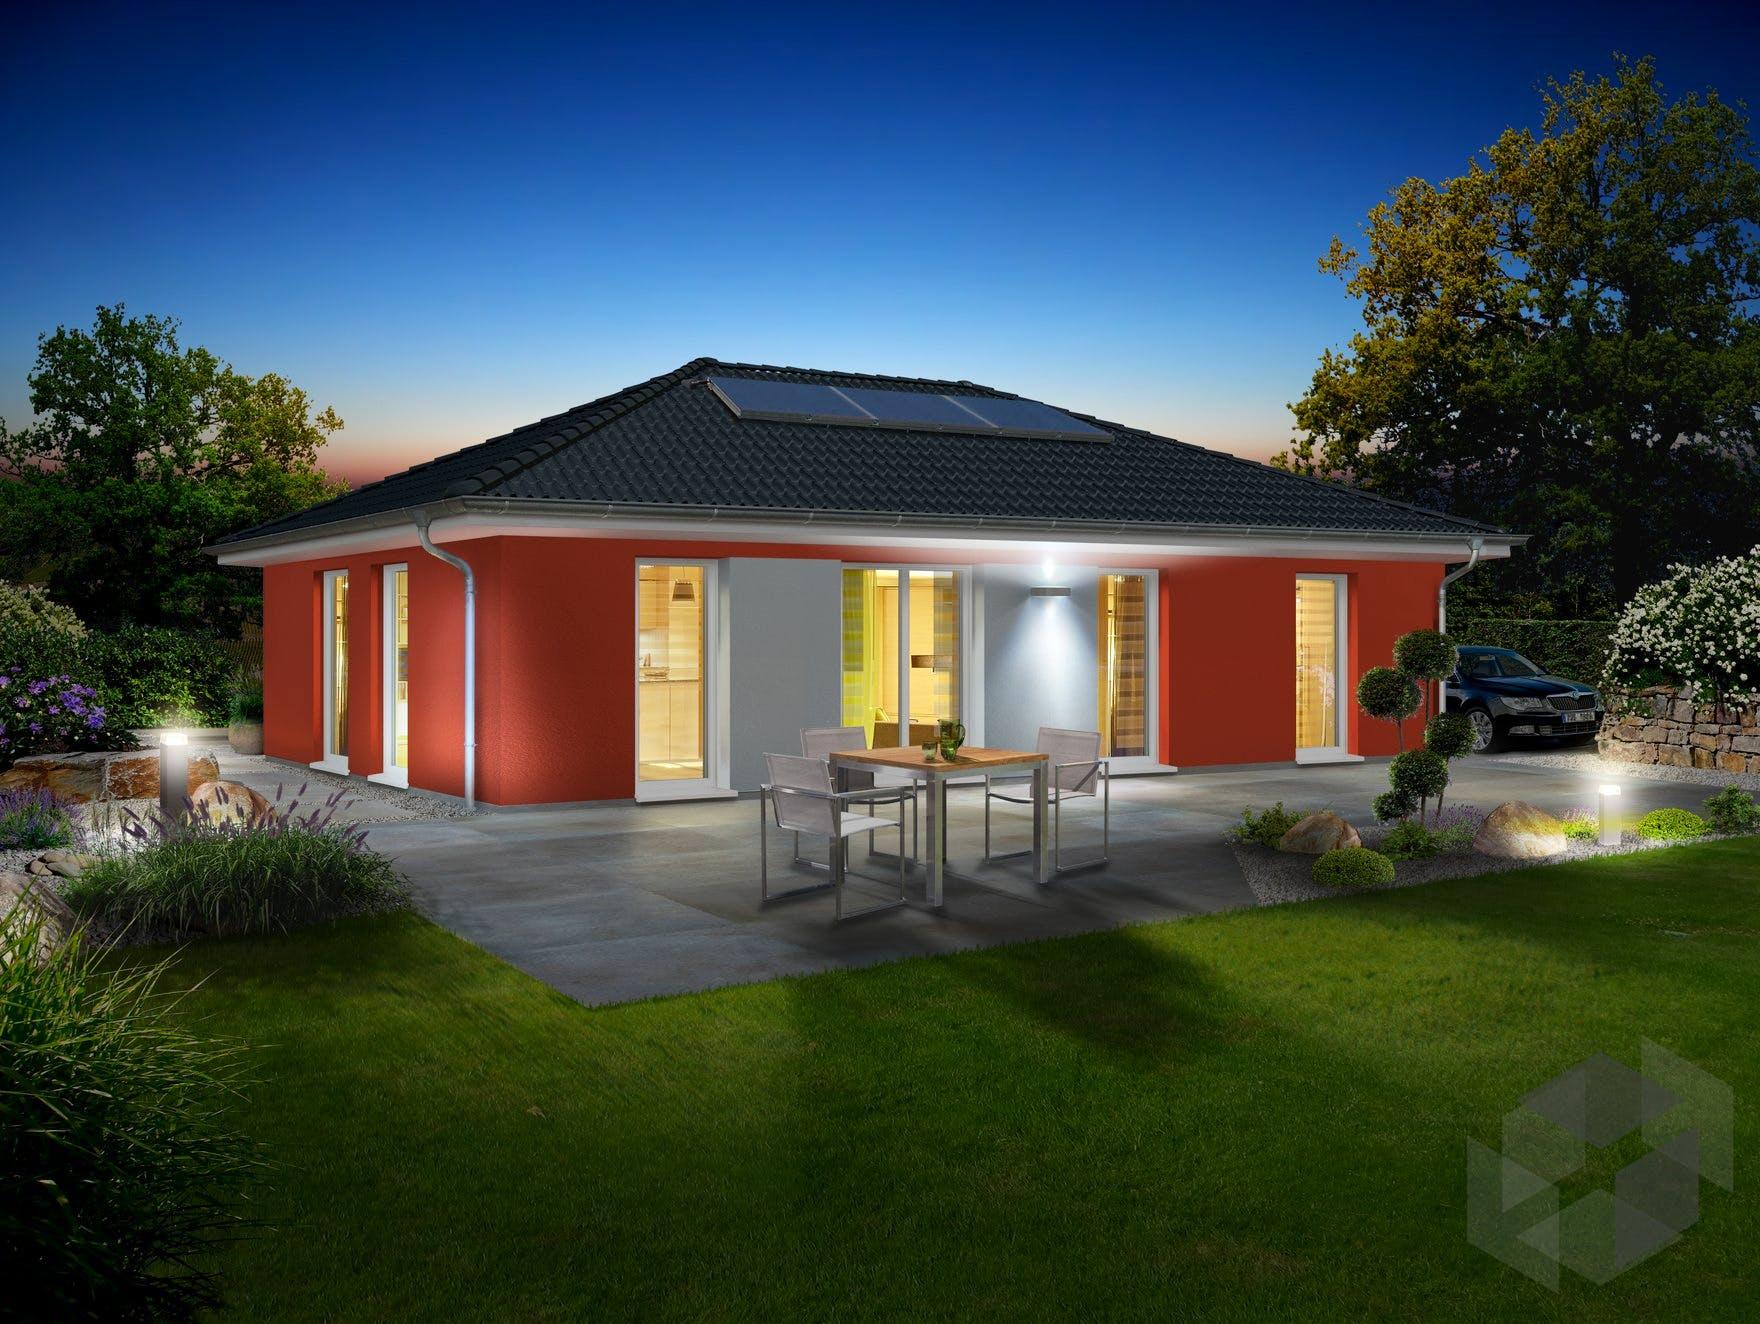 bungalow 110 von town country haus walmdach. Black Bedroom Furniture Sets. Home Design Ideas